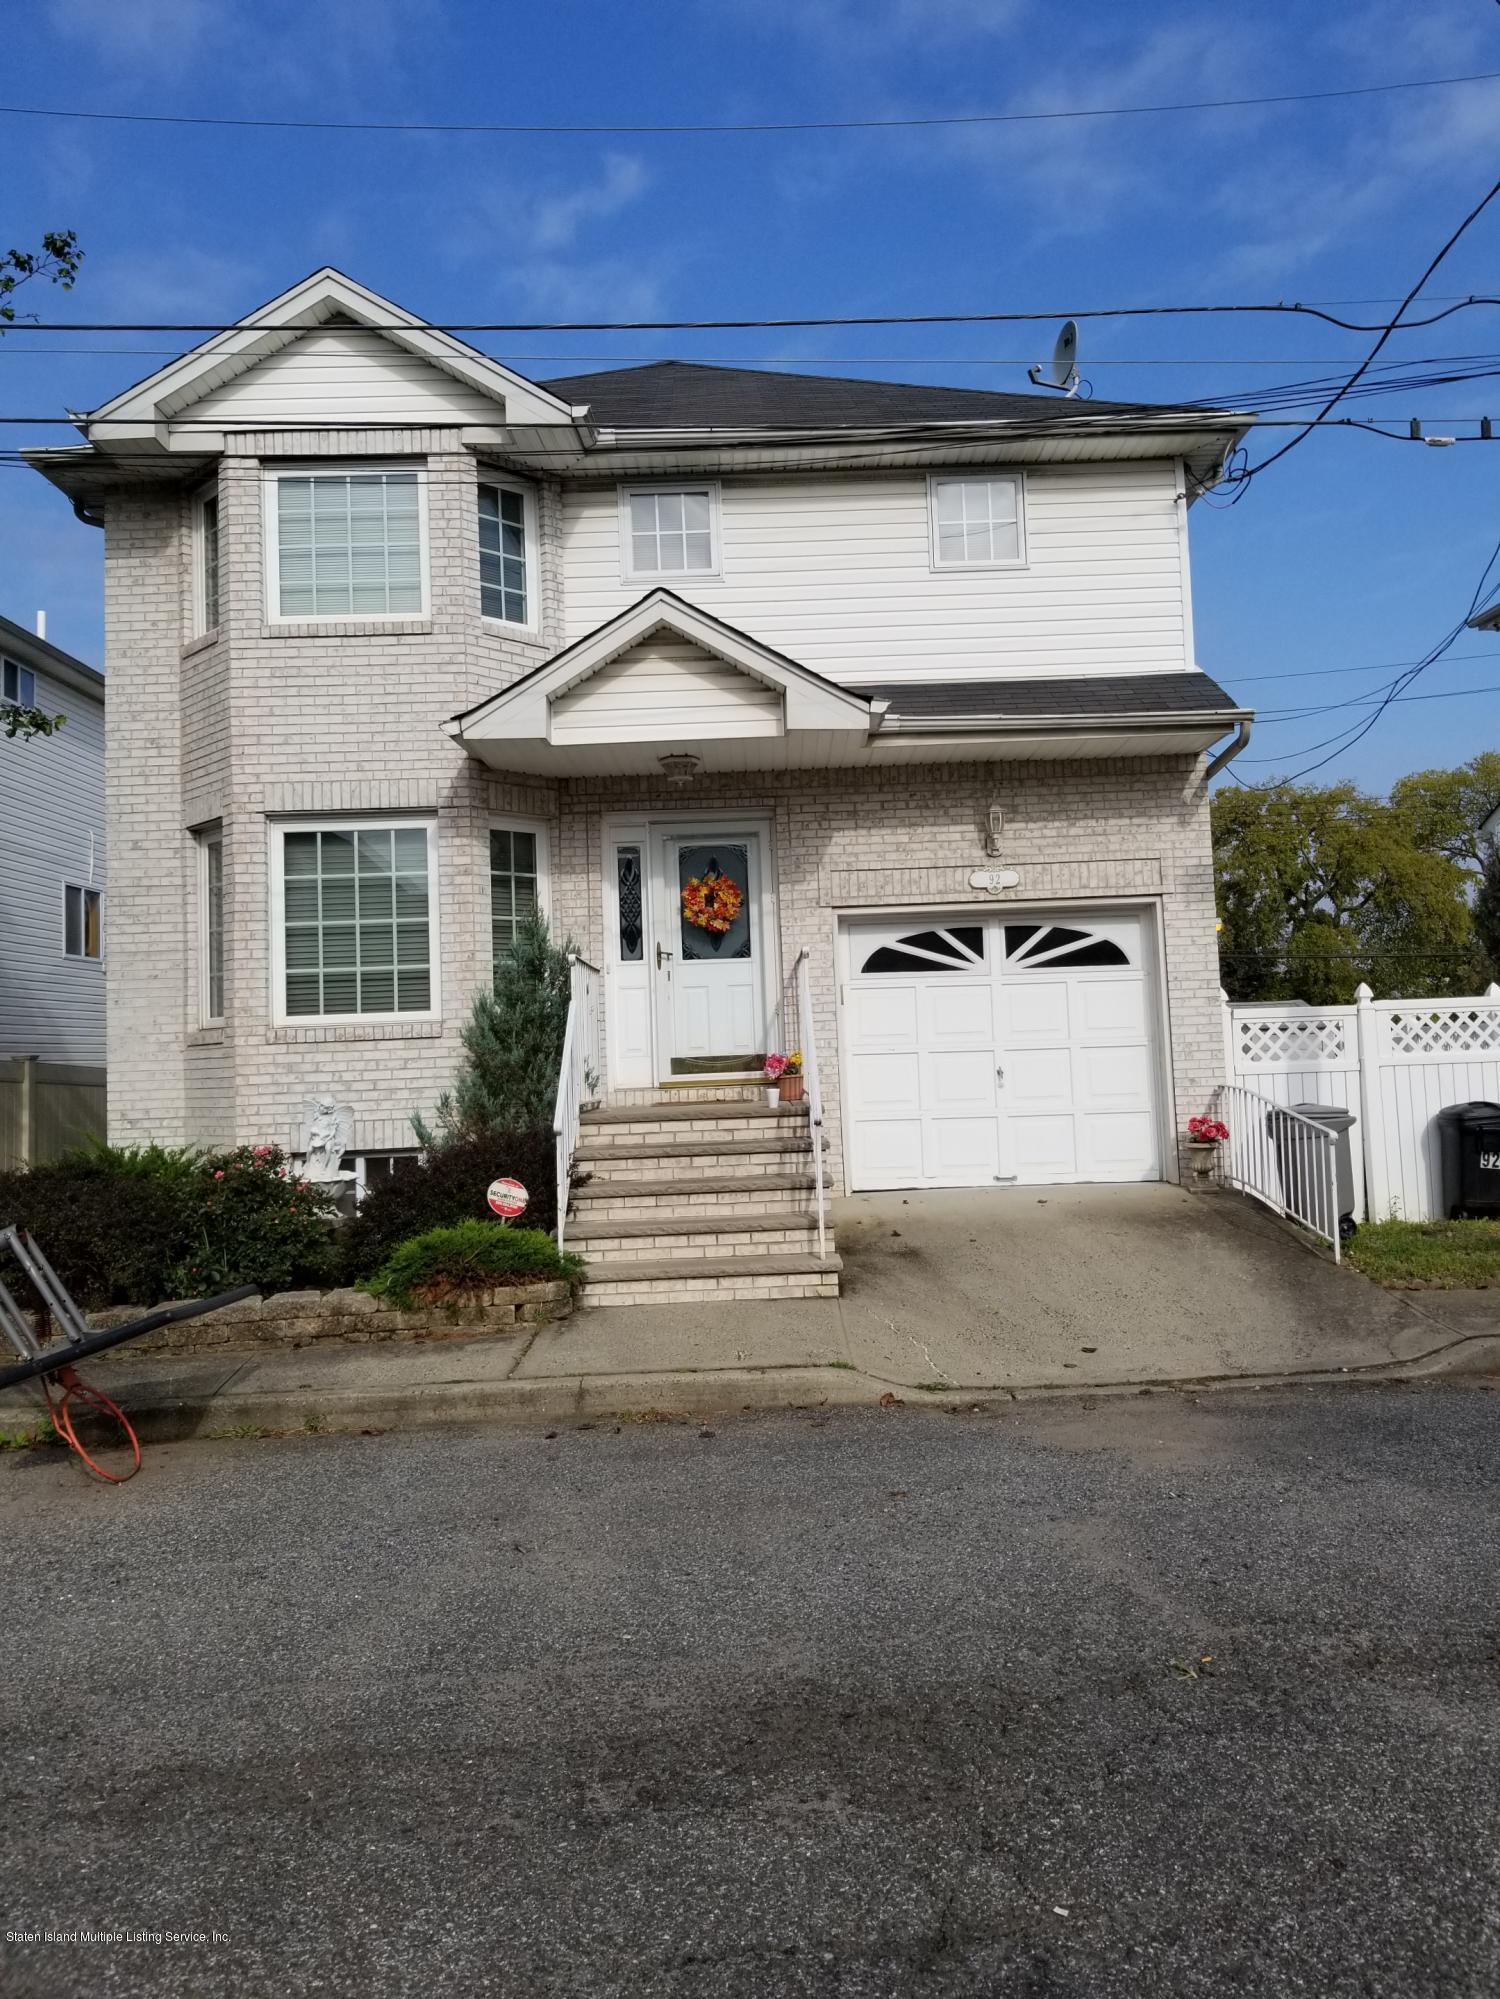 Single Family - Detached 92 Meagan Loop  Staten Island, NY 10307, MLS-1123137-2